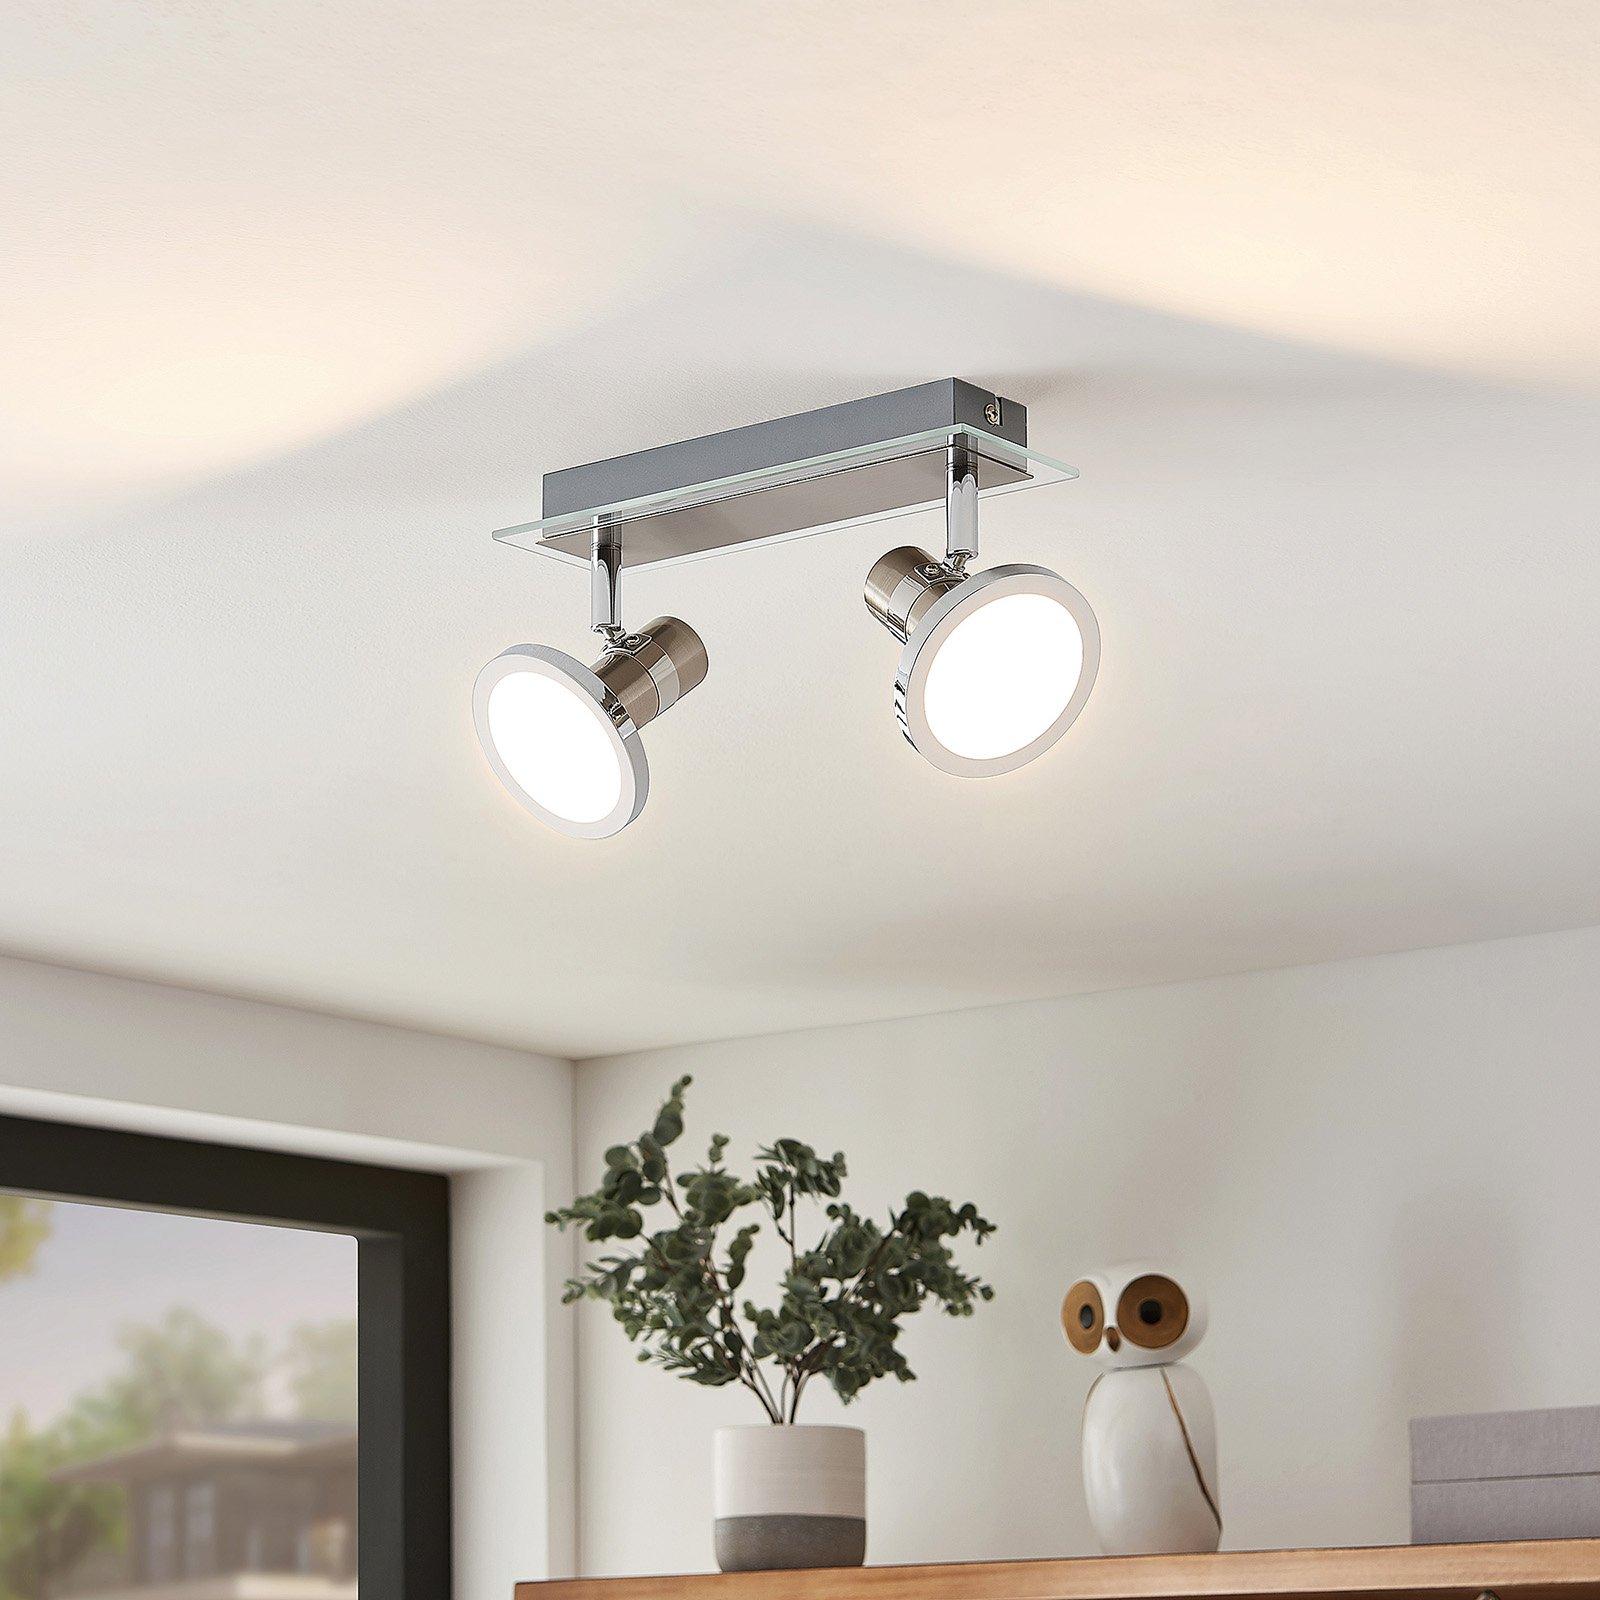 Lindby Kajetan LED-lyskaster, nikkel, 2 lyskilder